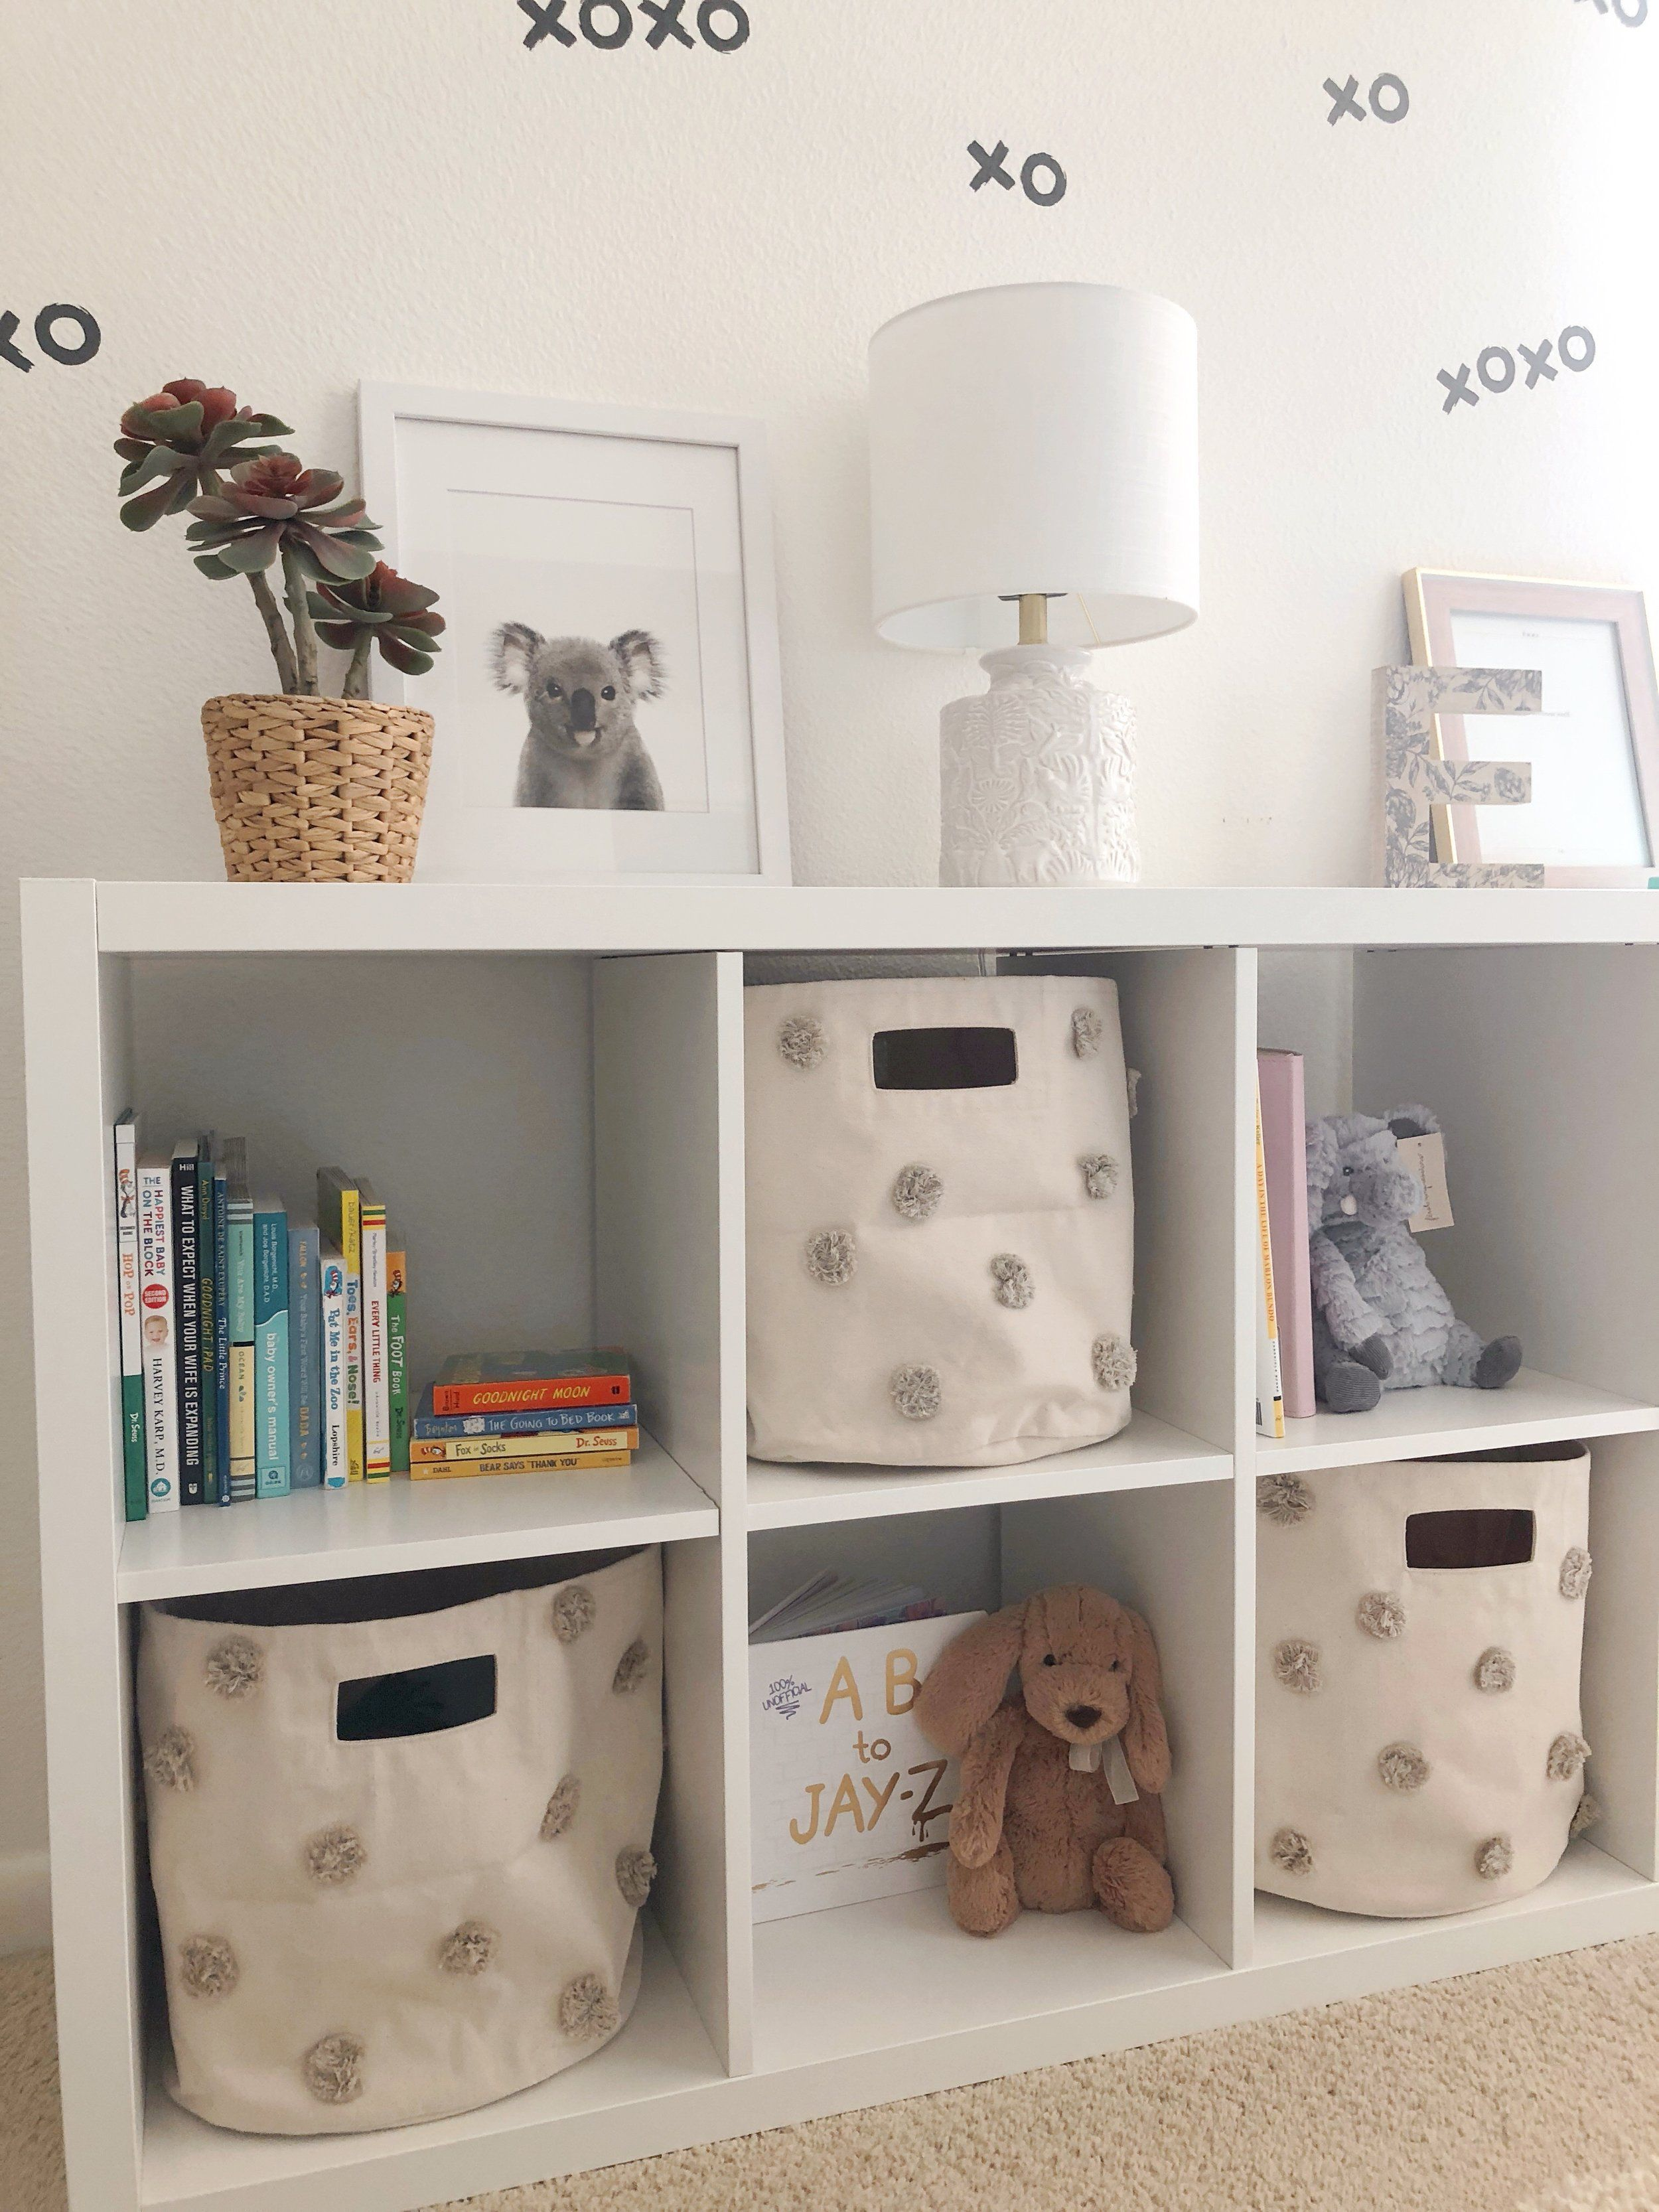 My Nursery Styling And Organization Project Was Made Simple With This White Ikea Kallax Shelf We Used It As A W Nursery Shelves Ikea Nursery Baby Room Storage